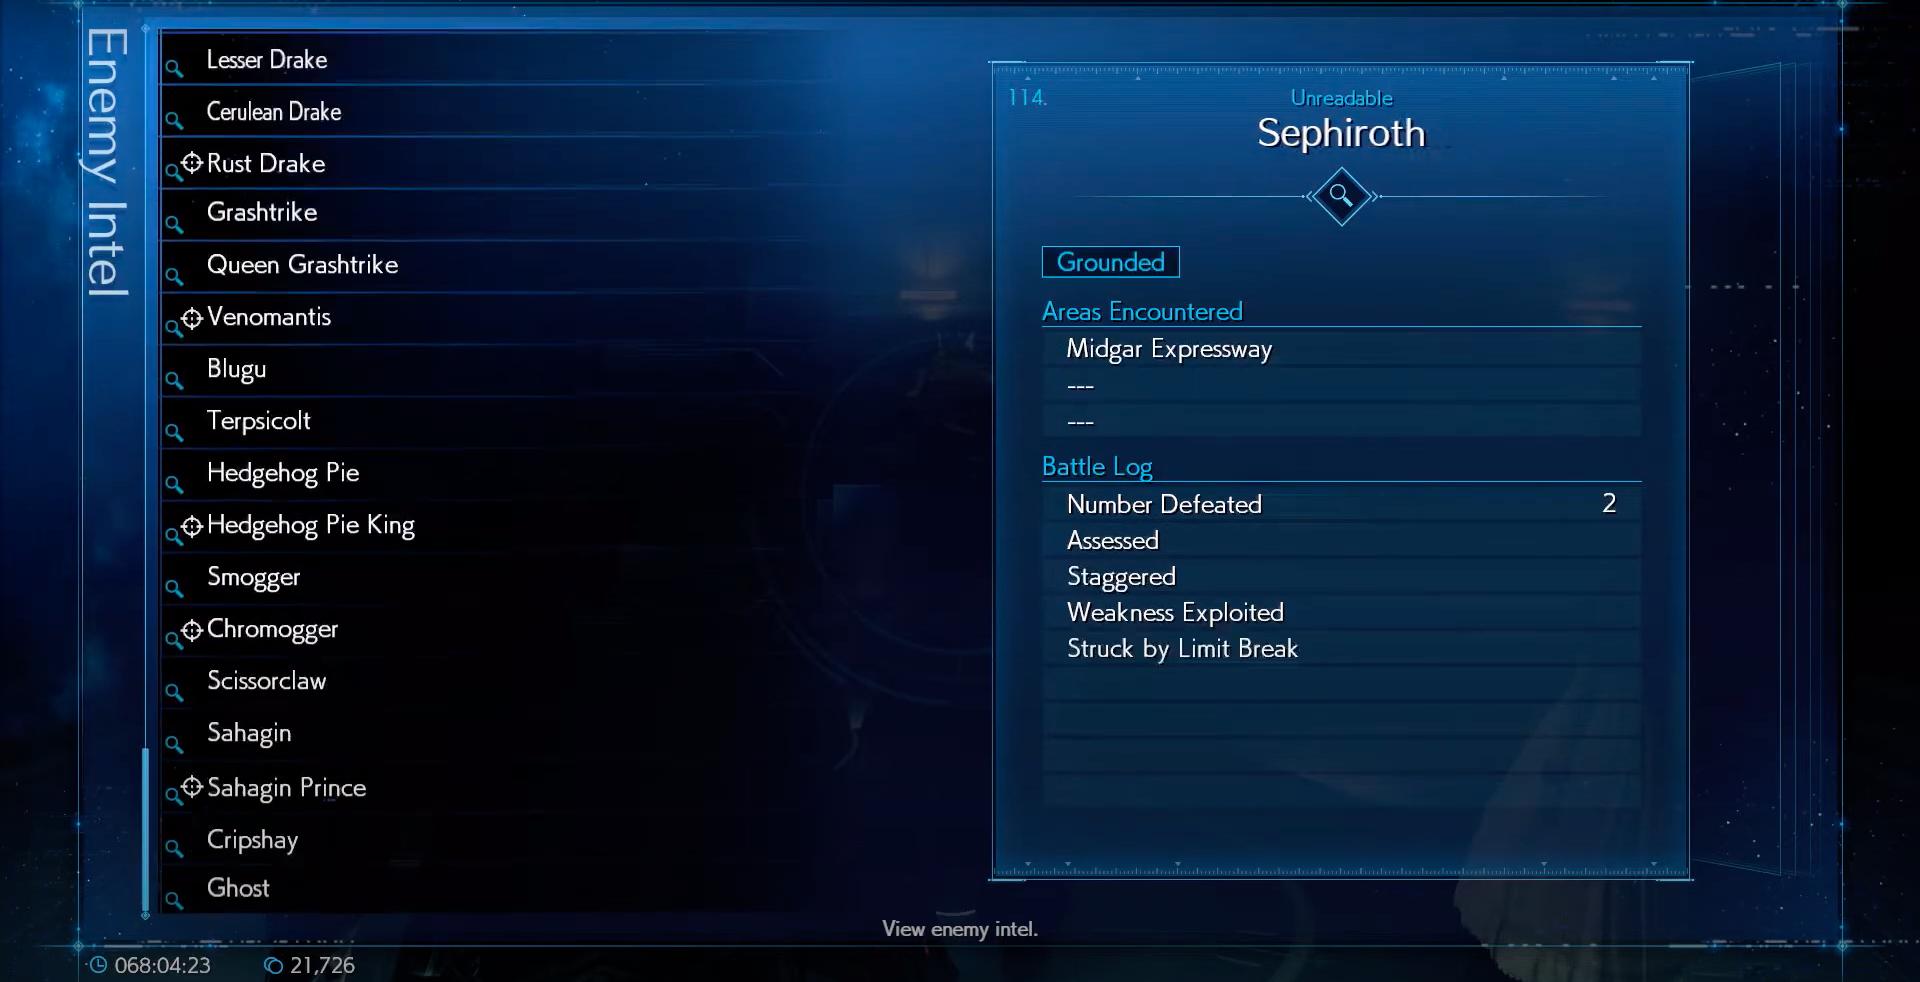 Enemy Intel: Sephiroth